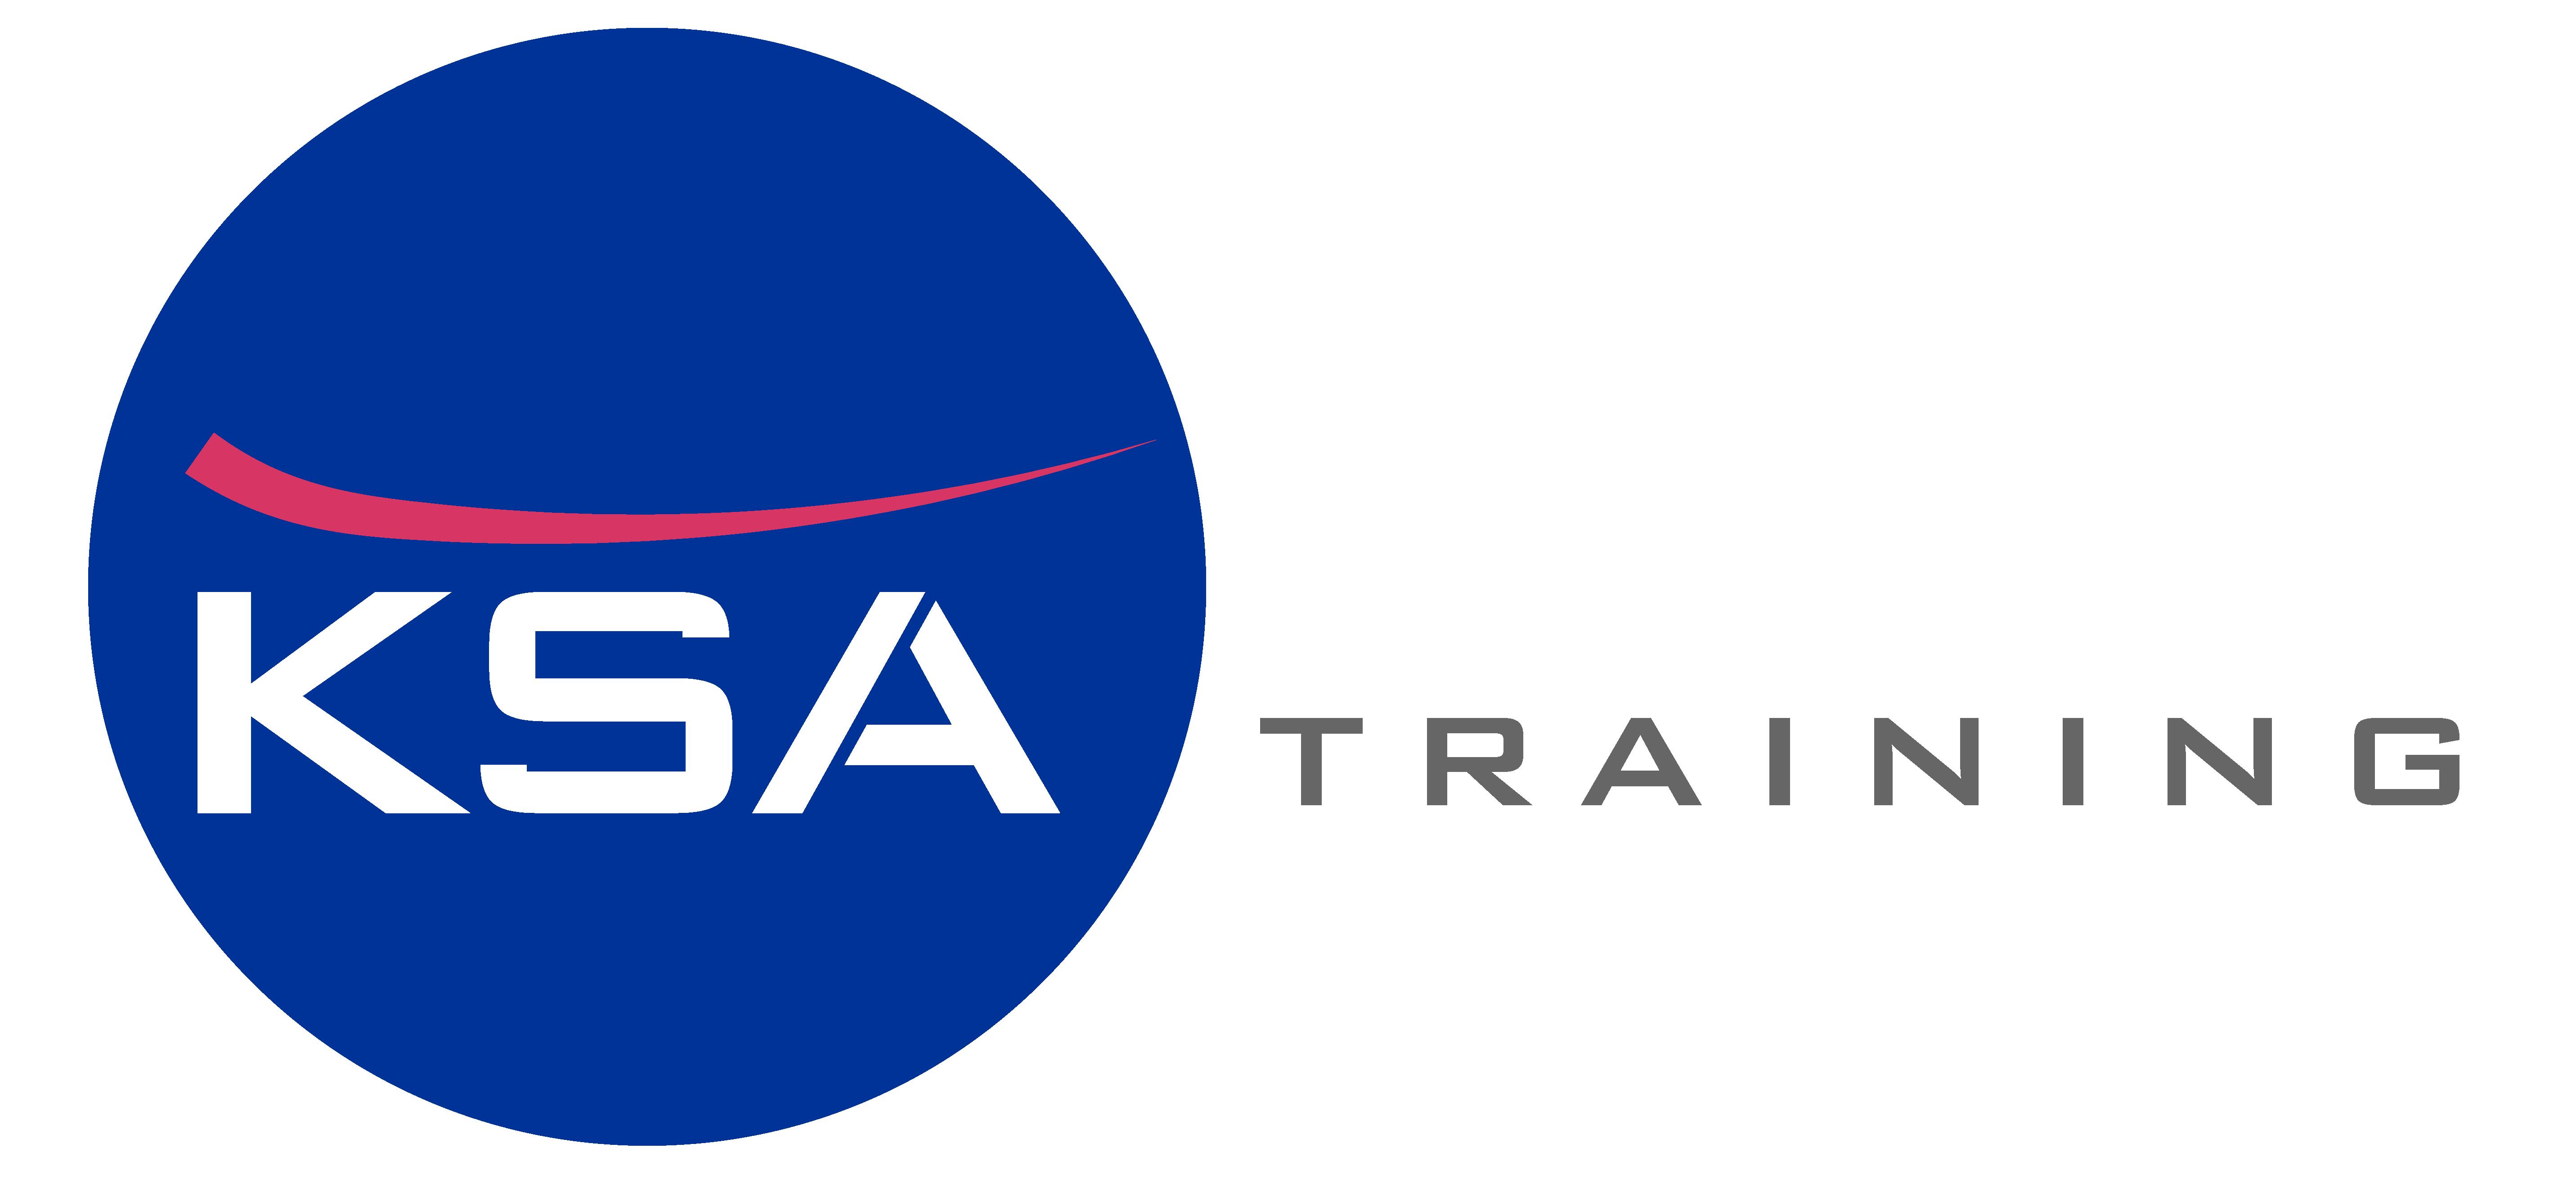 ksa-training